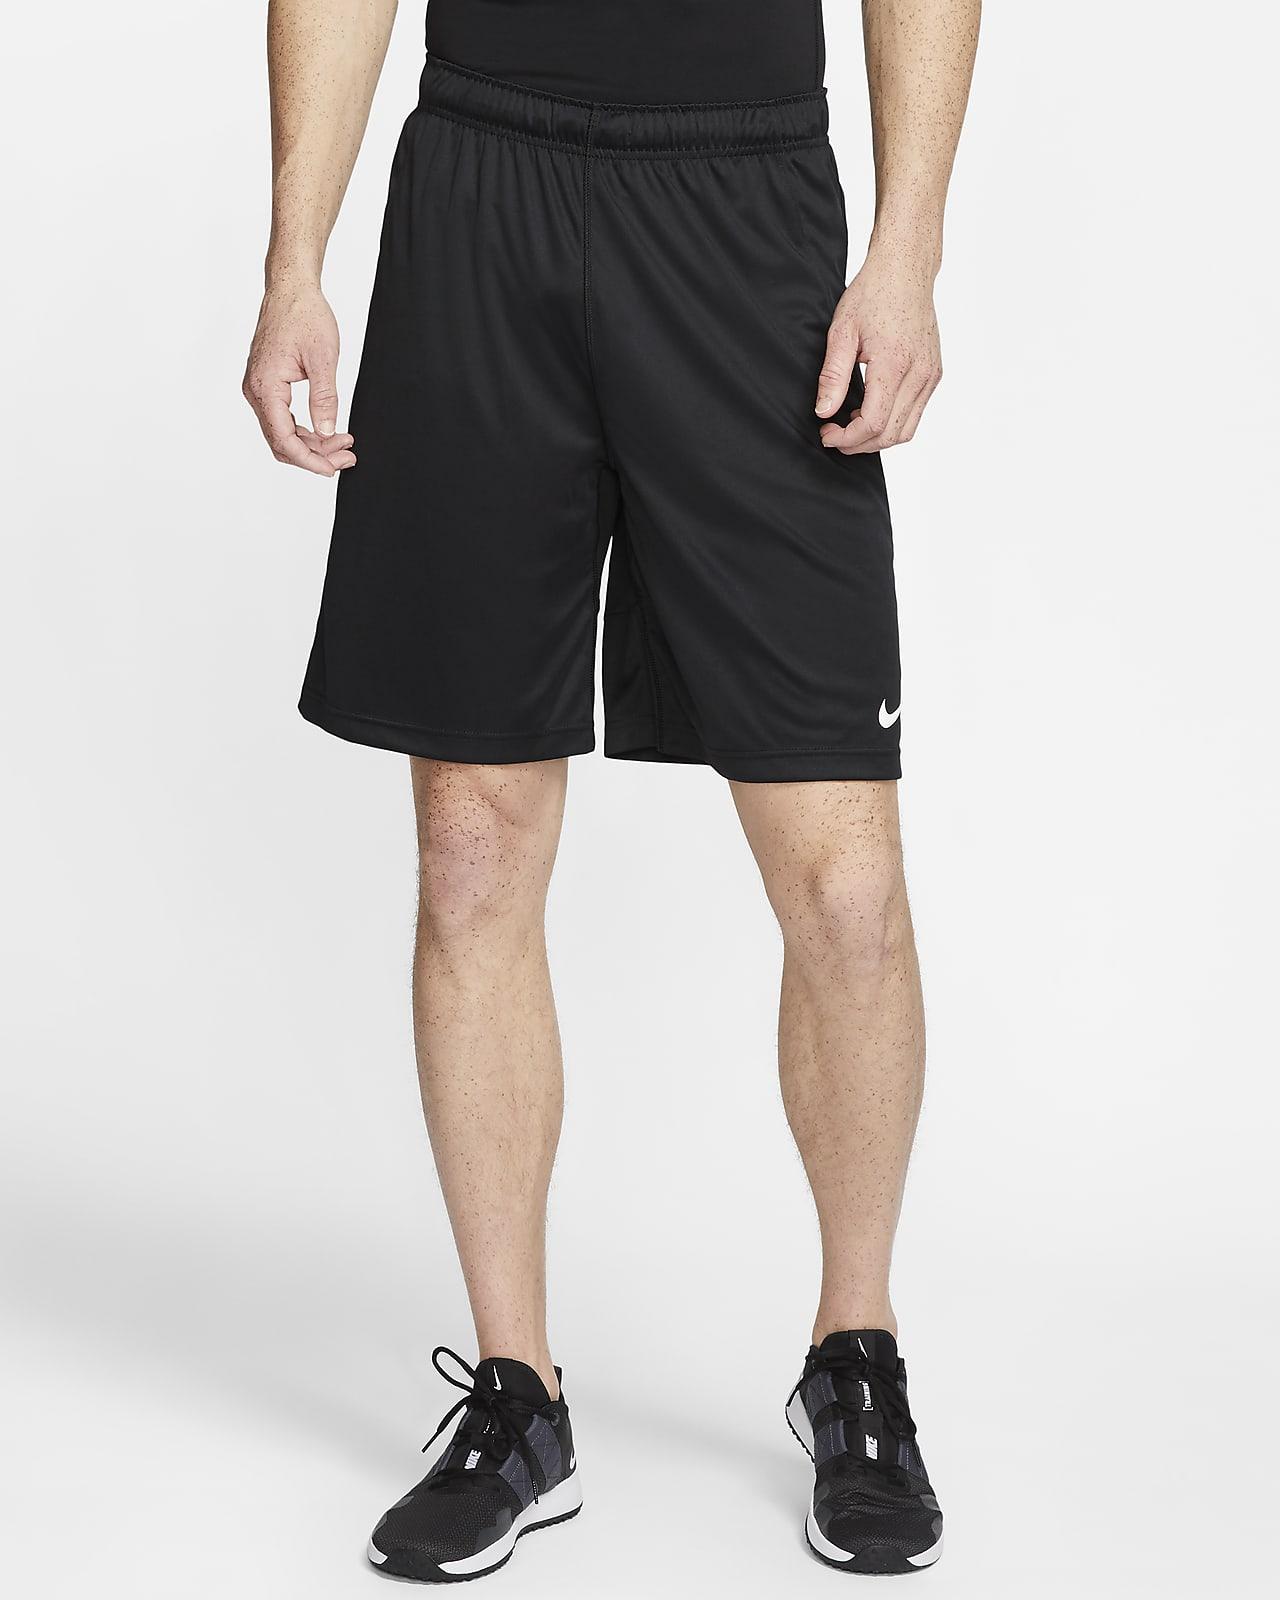 Shorts de fútbol americano para hombre Nike Dri-FIT